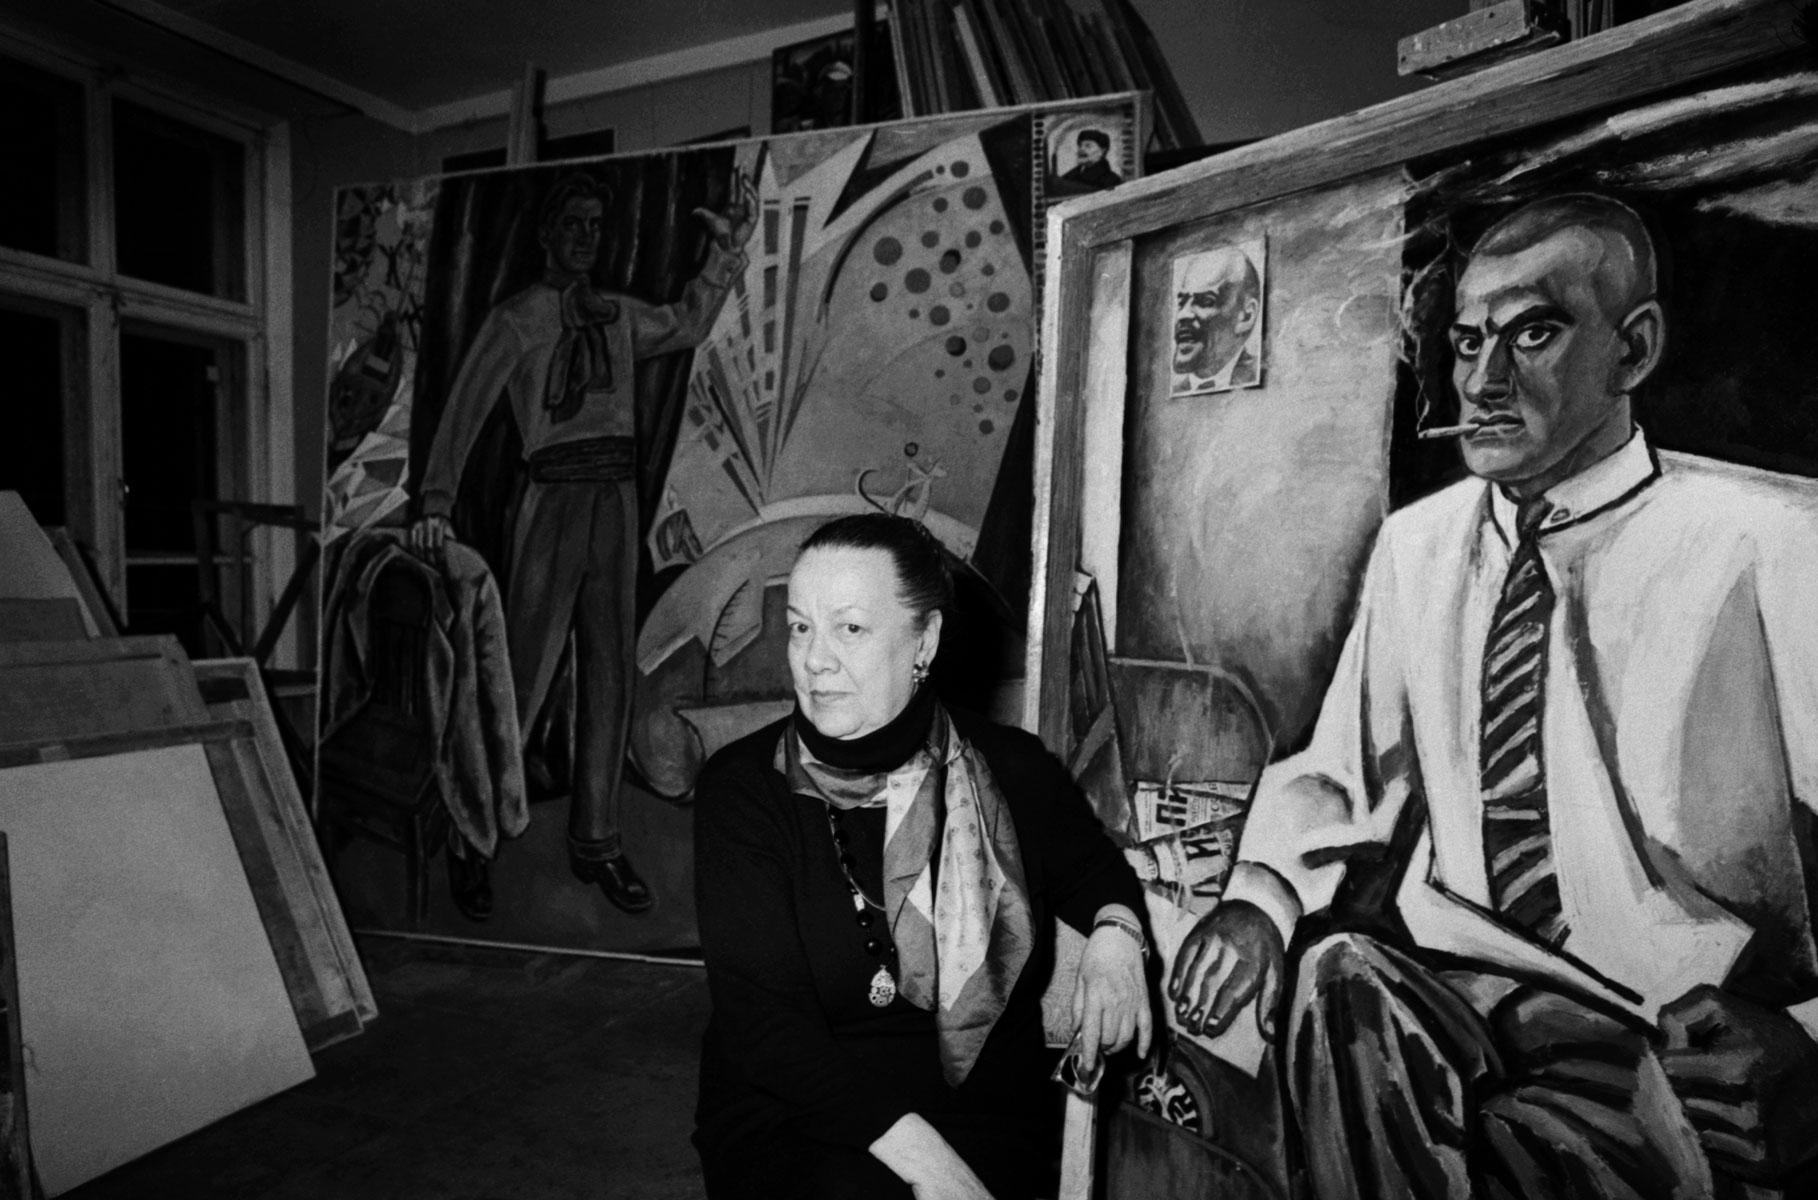 Патрисия Томпсон спортретом отца кисти художника Бориса Кожевникова вего мастерской.